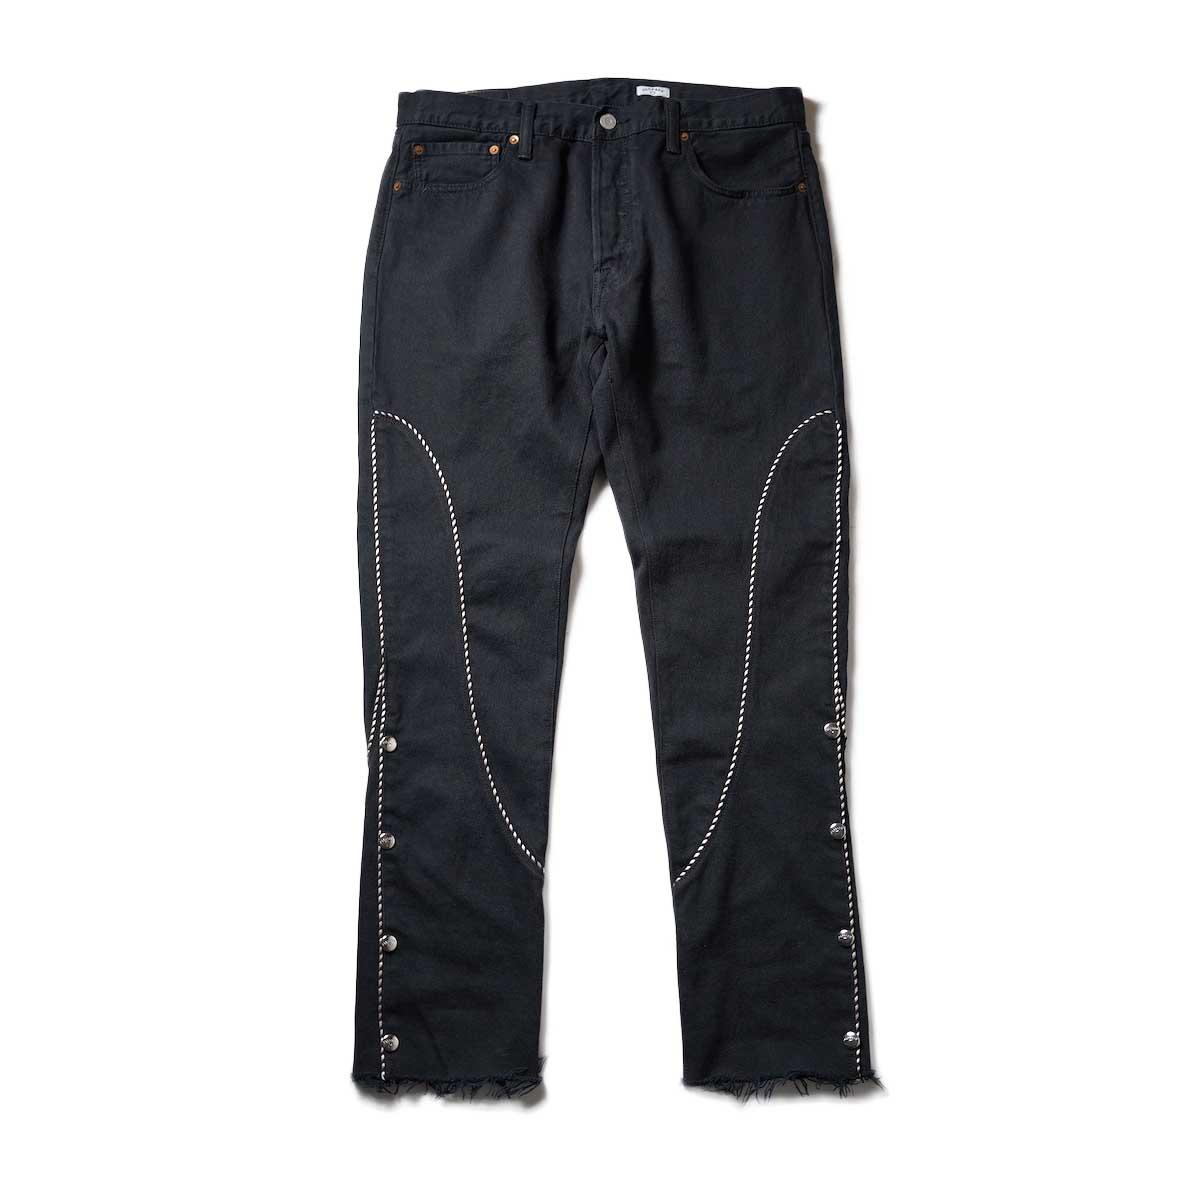 OLD PARK / Western Jeans2 Black (Lsize-B)正面